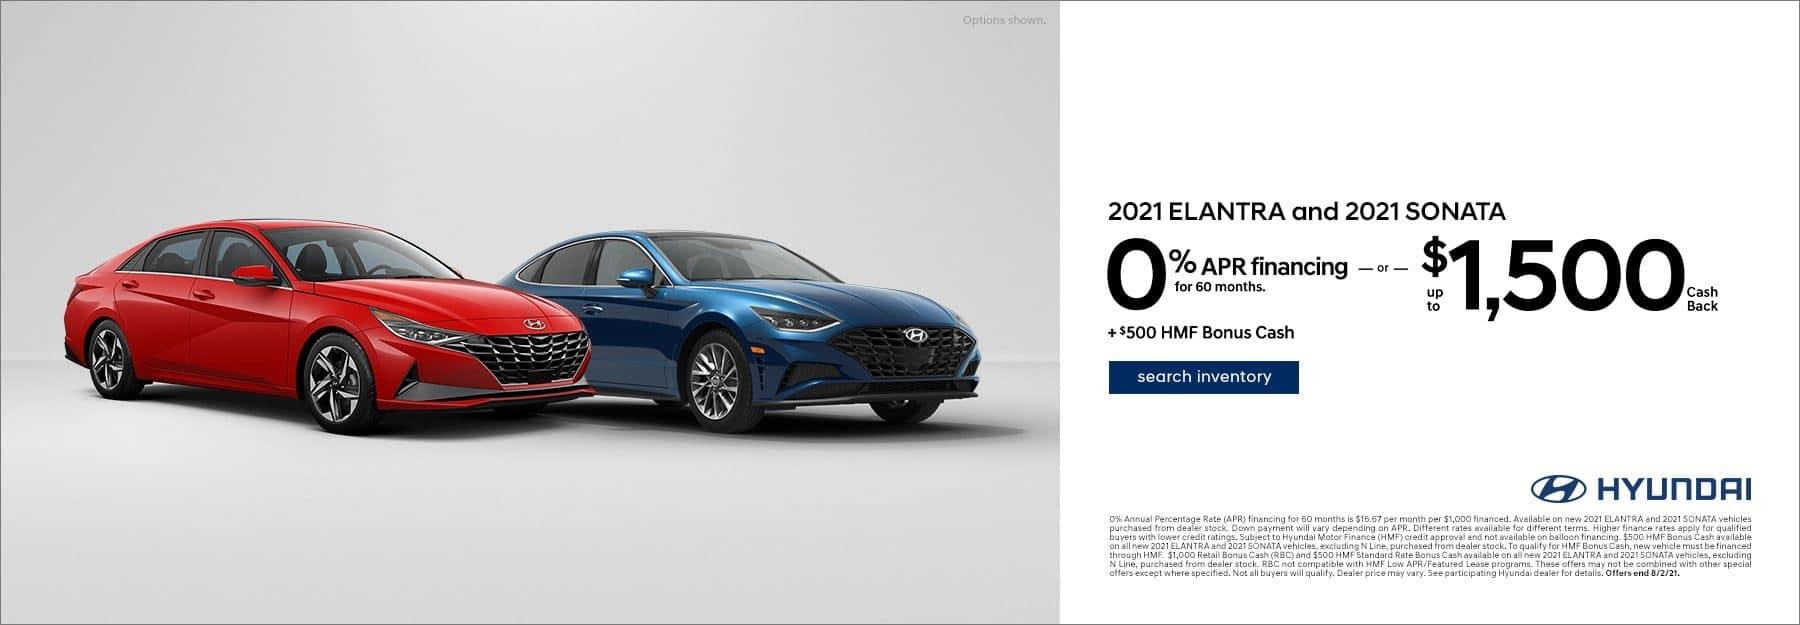 2021 Hyundai Sonata and Elantra offer